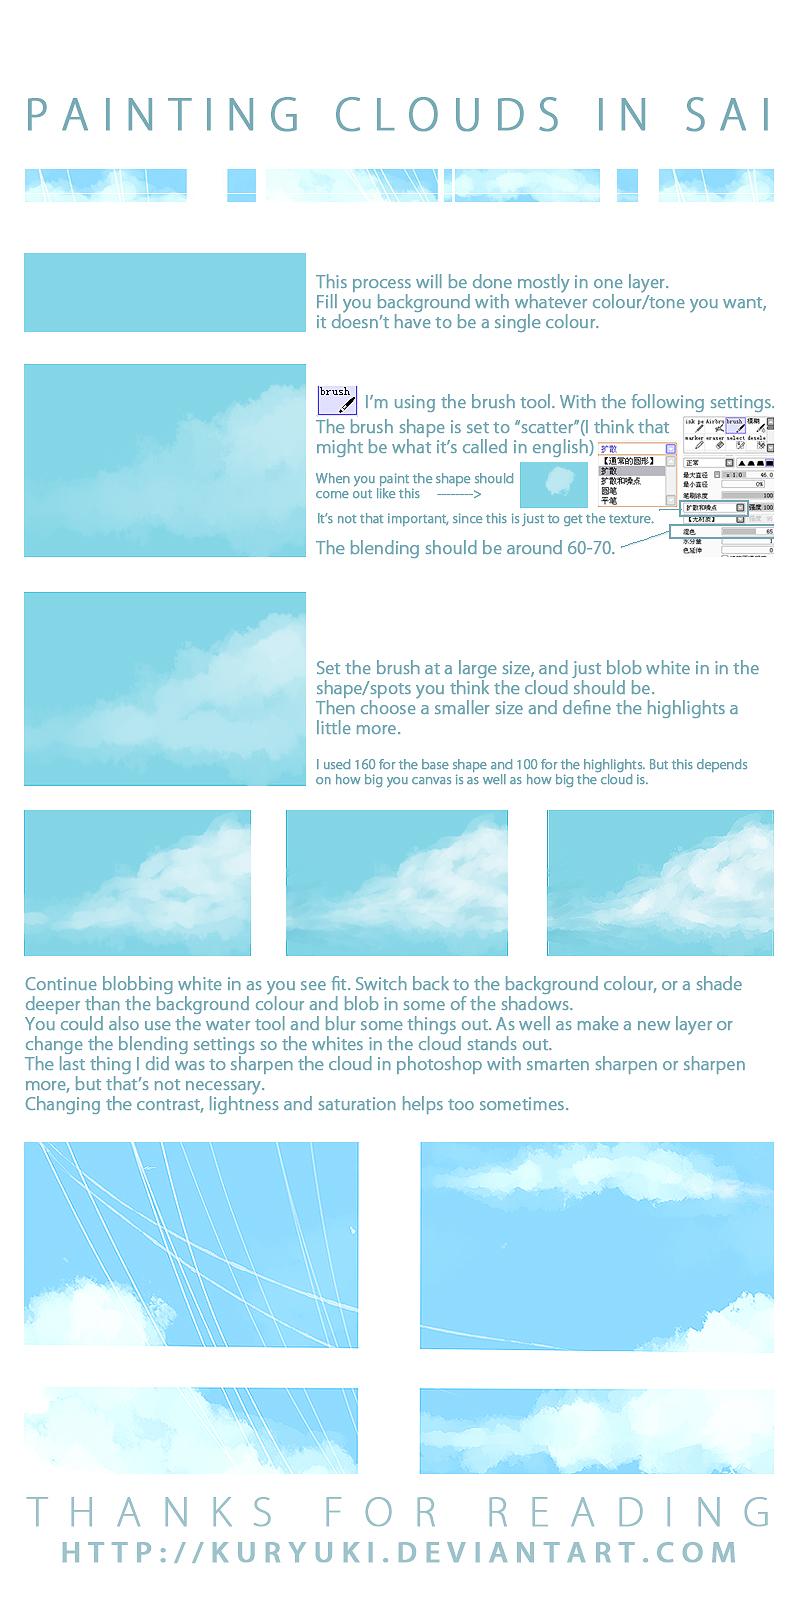 Cloud Painting Tutorial in SAI by kuryuki